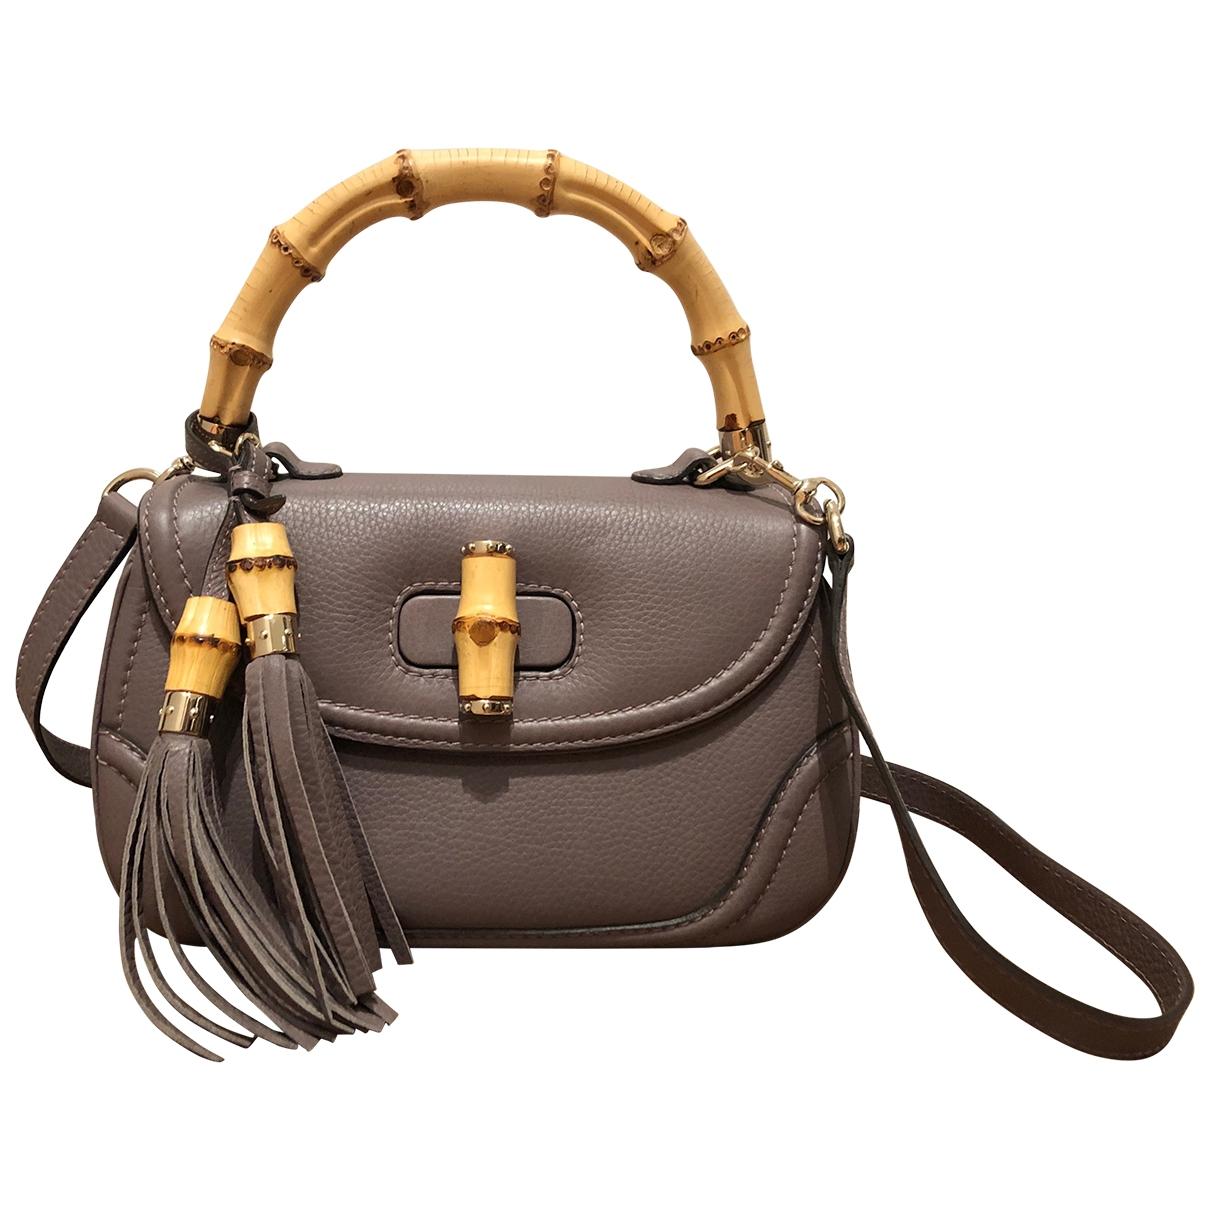 Gucci Bamboo Handtasche in Leder